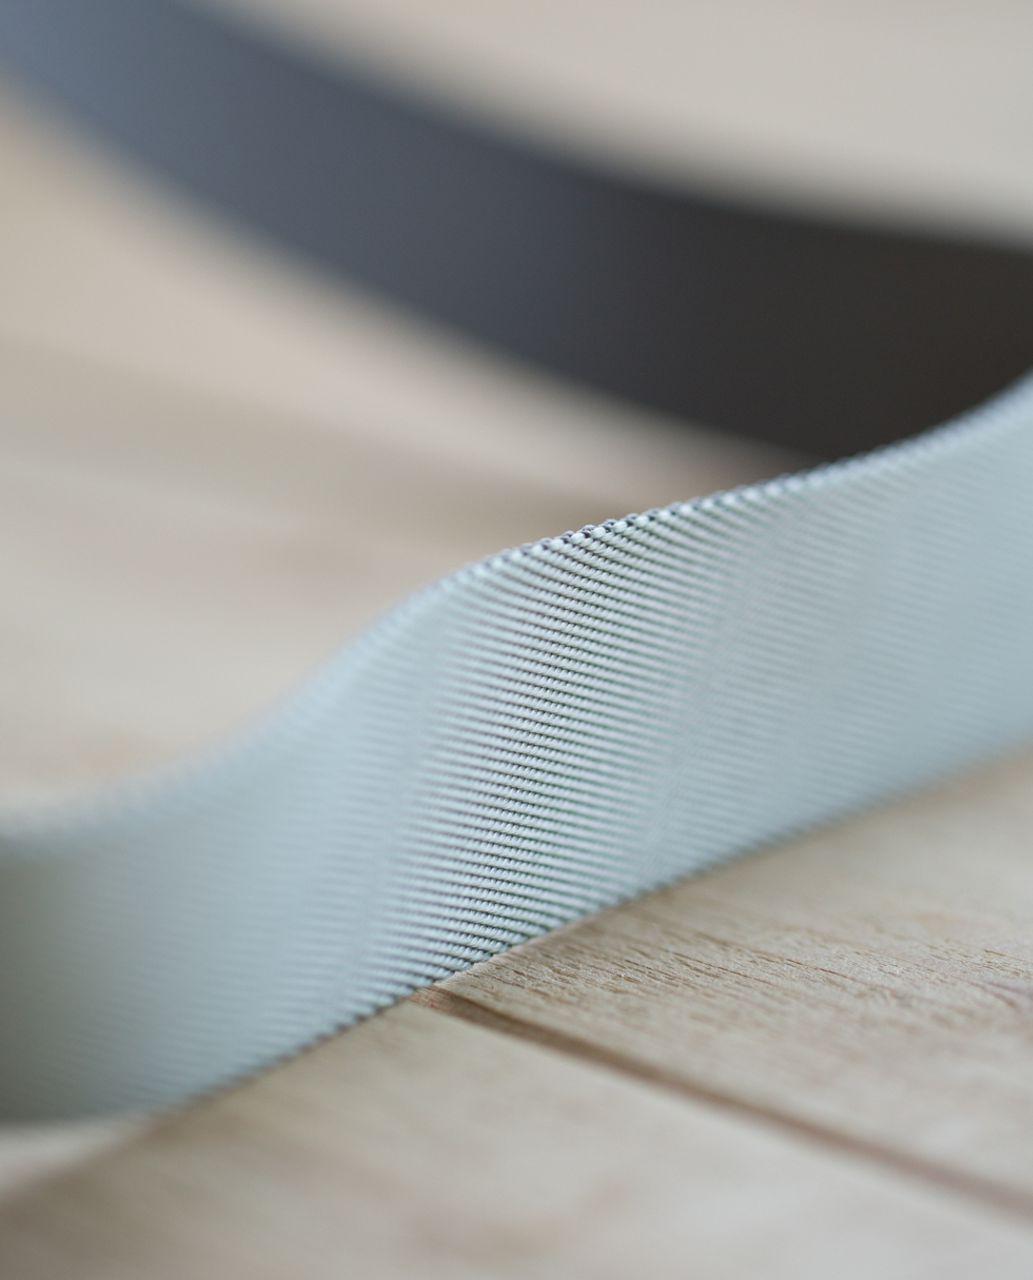 Lululemon Loop It Up Mat Strap - Minty Grey / Earl Grey (First Release)